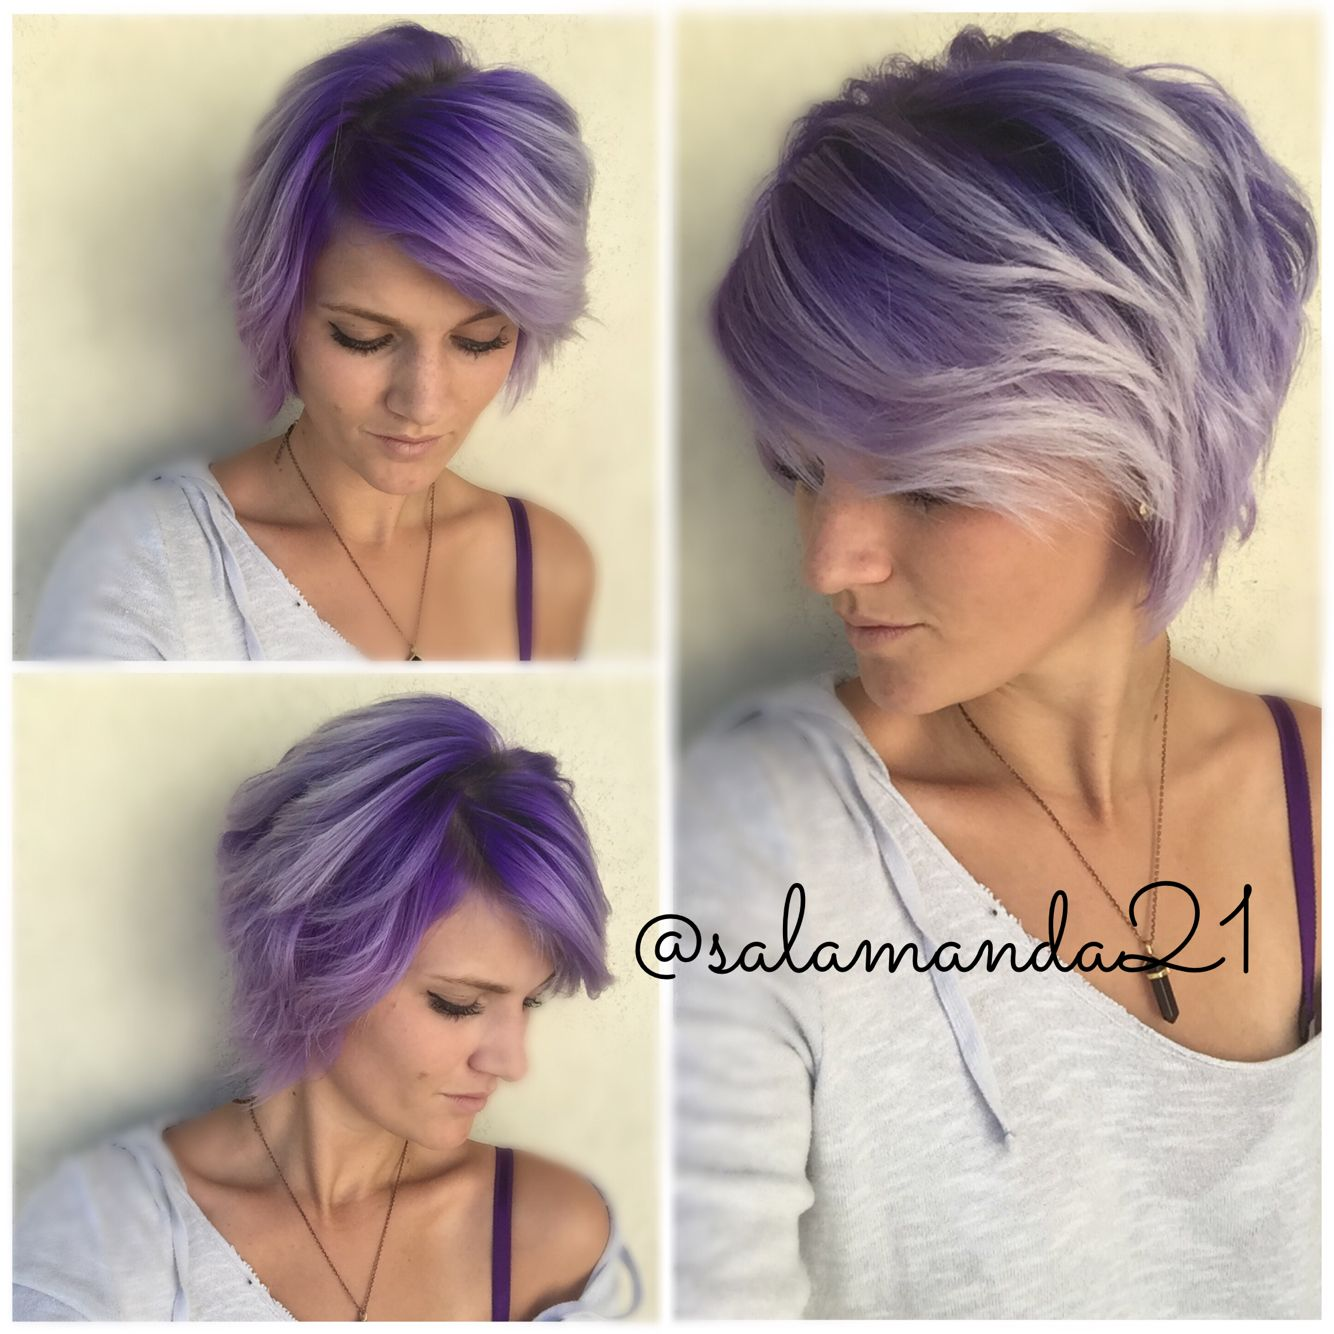 Purple Ombr On Short Hair My Hair In 2018 Pinterest Short